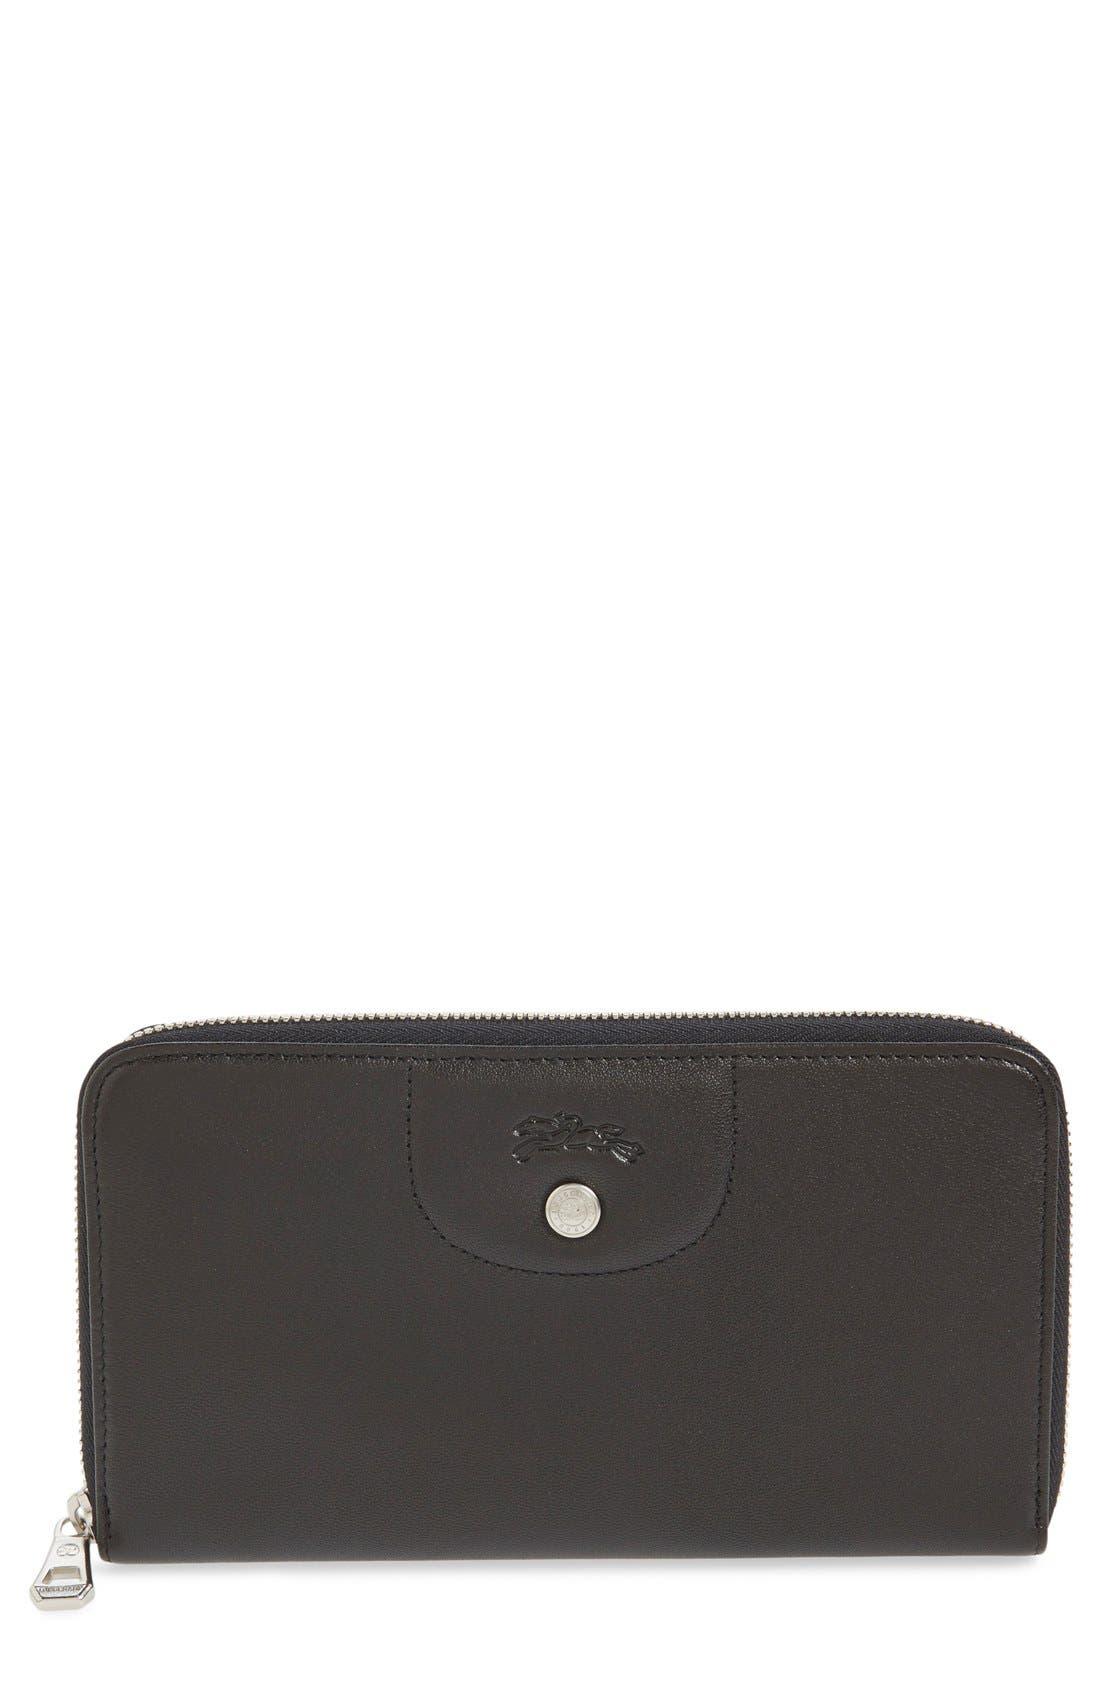 Main Image - Longchamp 'Le Pliage' Leather Zip Around Wallet